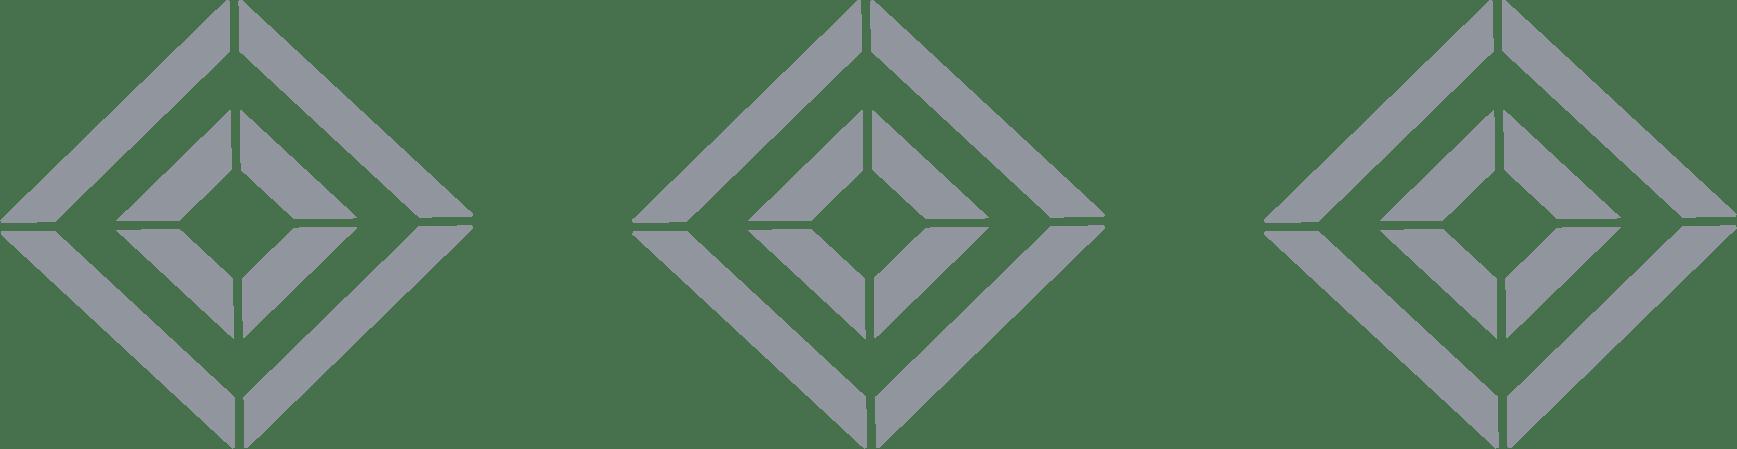 CC Diamond Divider 3